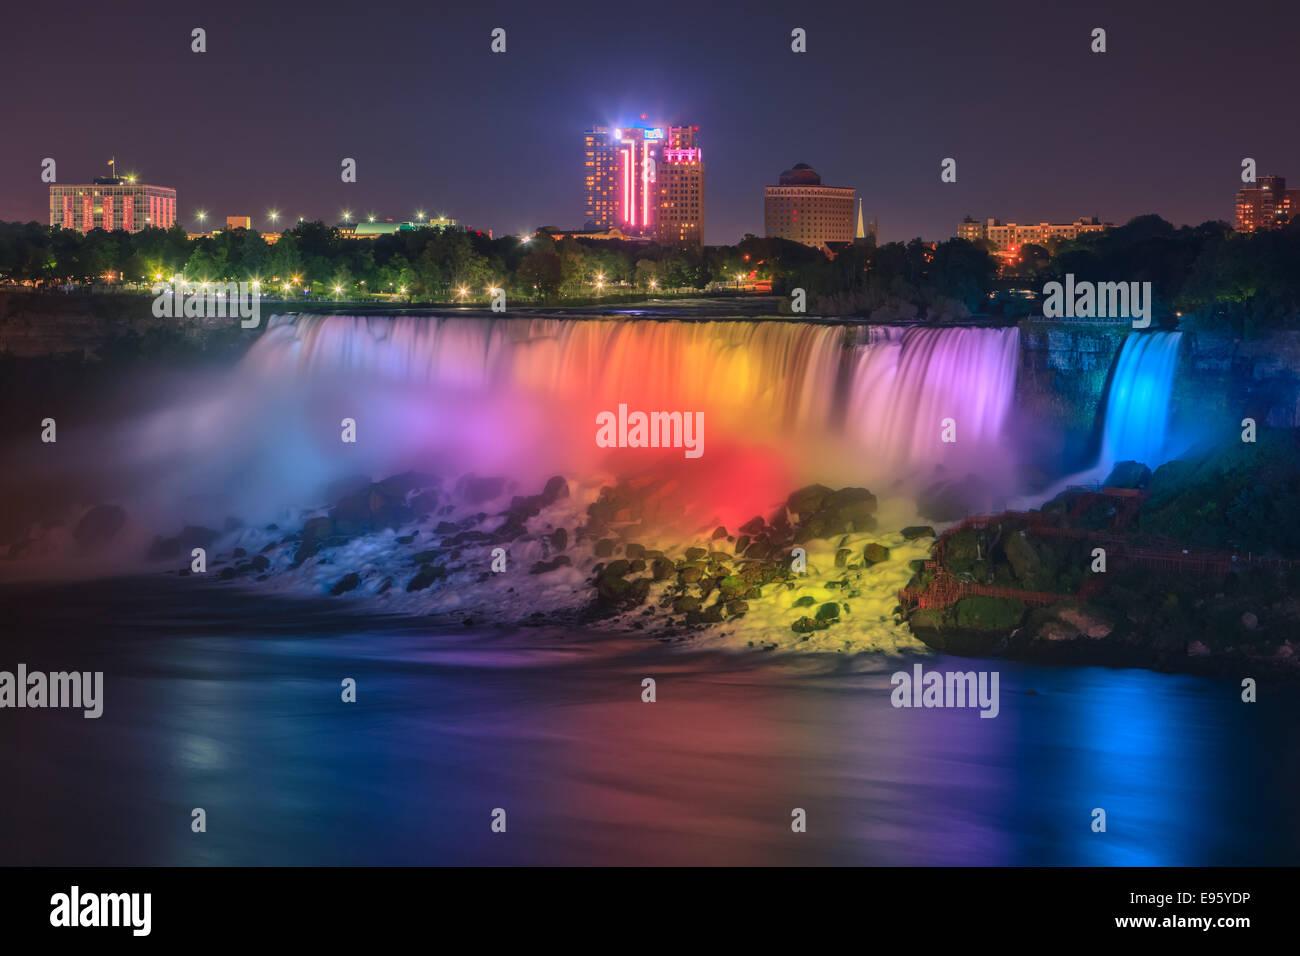 Light show at the American Falls, part of the Niagara Falls, Ontario, Canada. - Stock Image